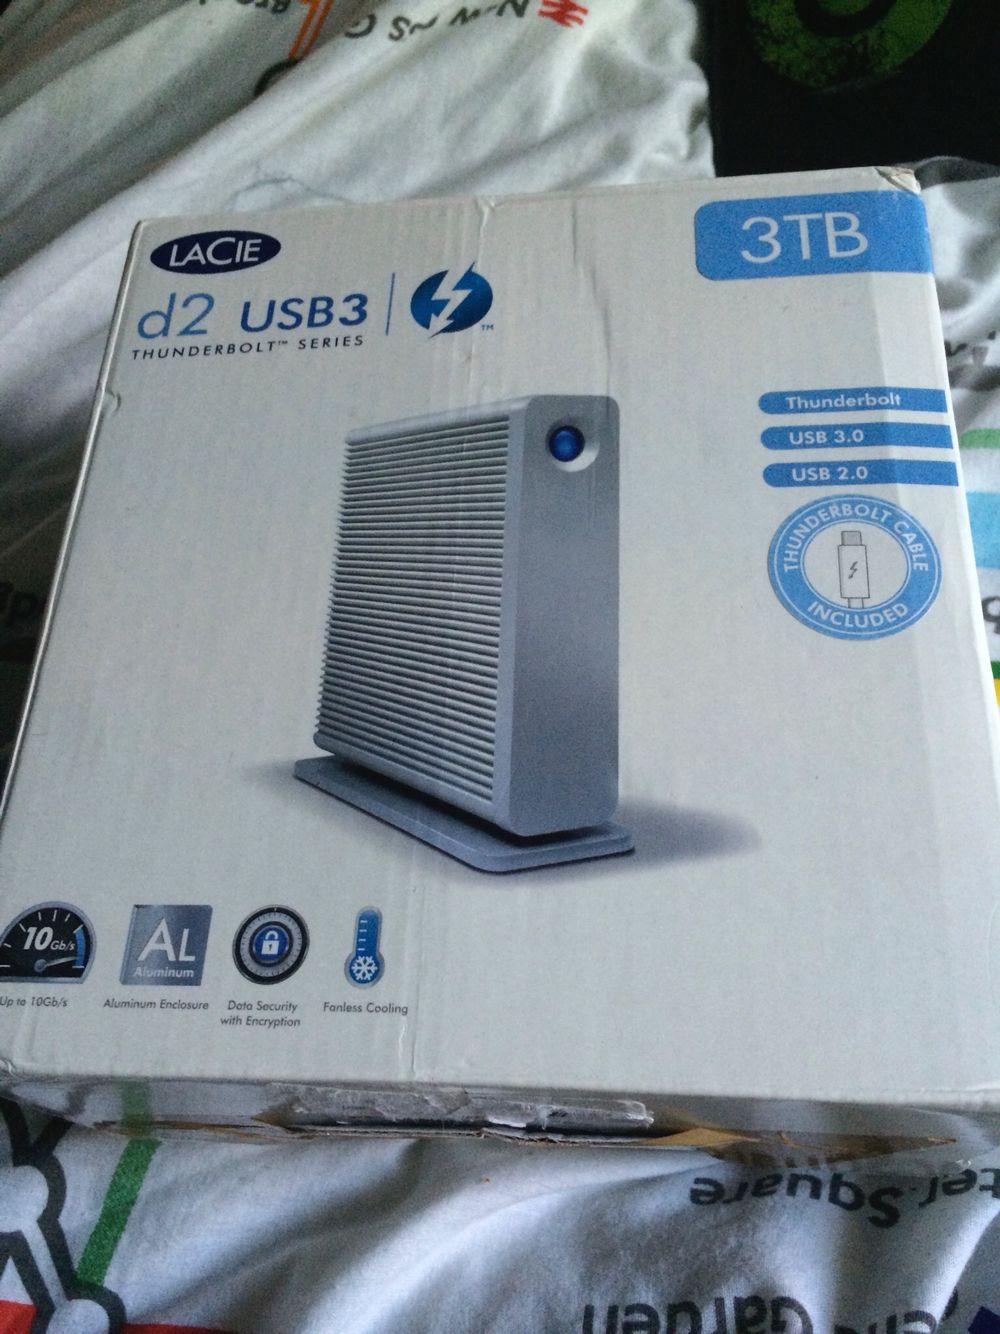 Lacie D2 Thunderbolt Hard Drive Technology Products Bluetooth Technology Amazon Echo